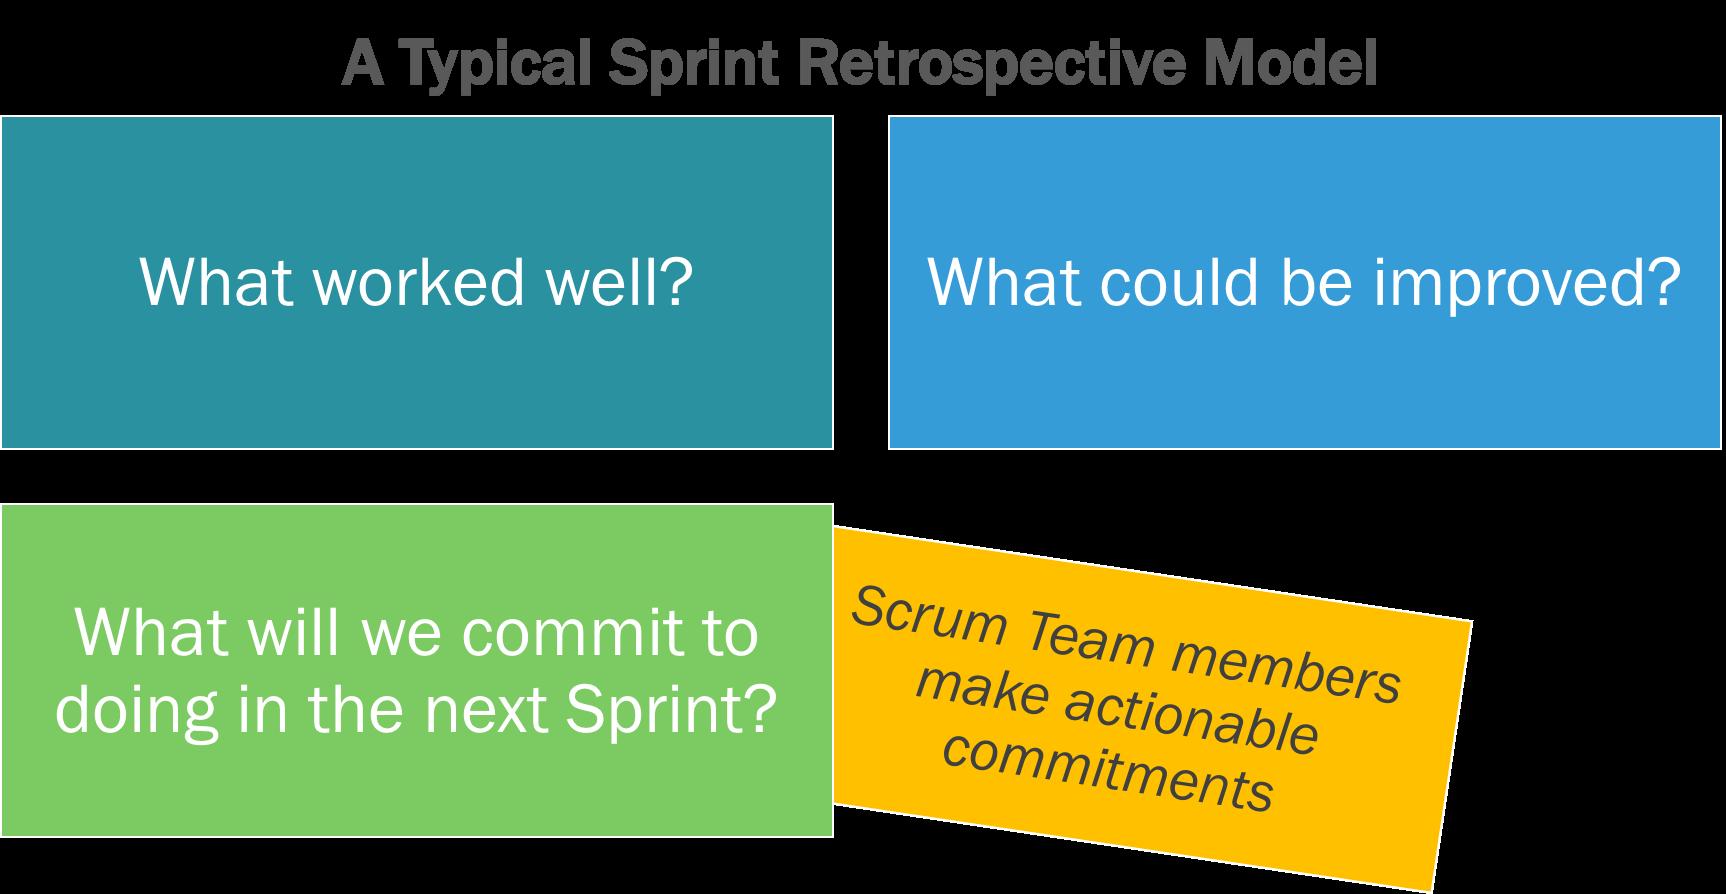 Typical Sprint Retrospective